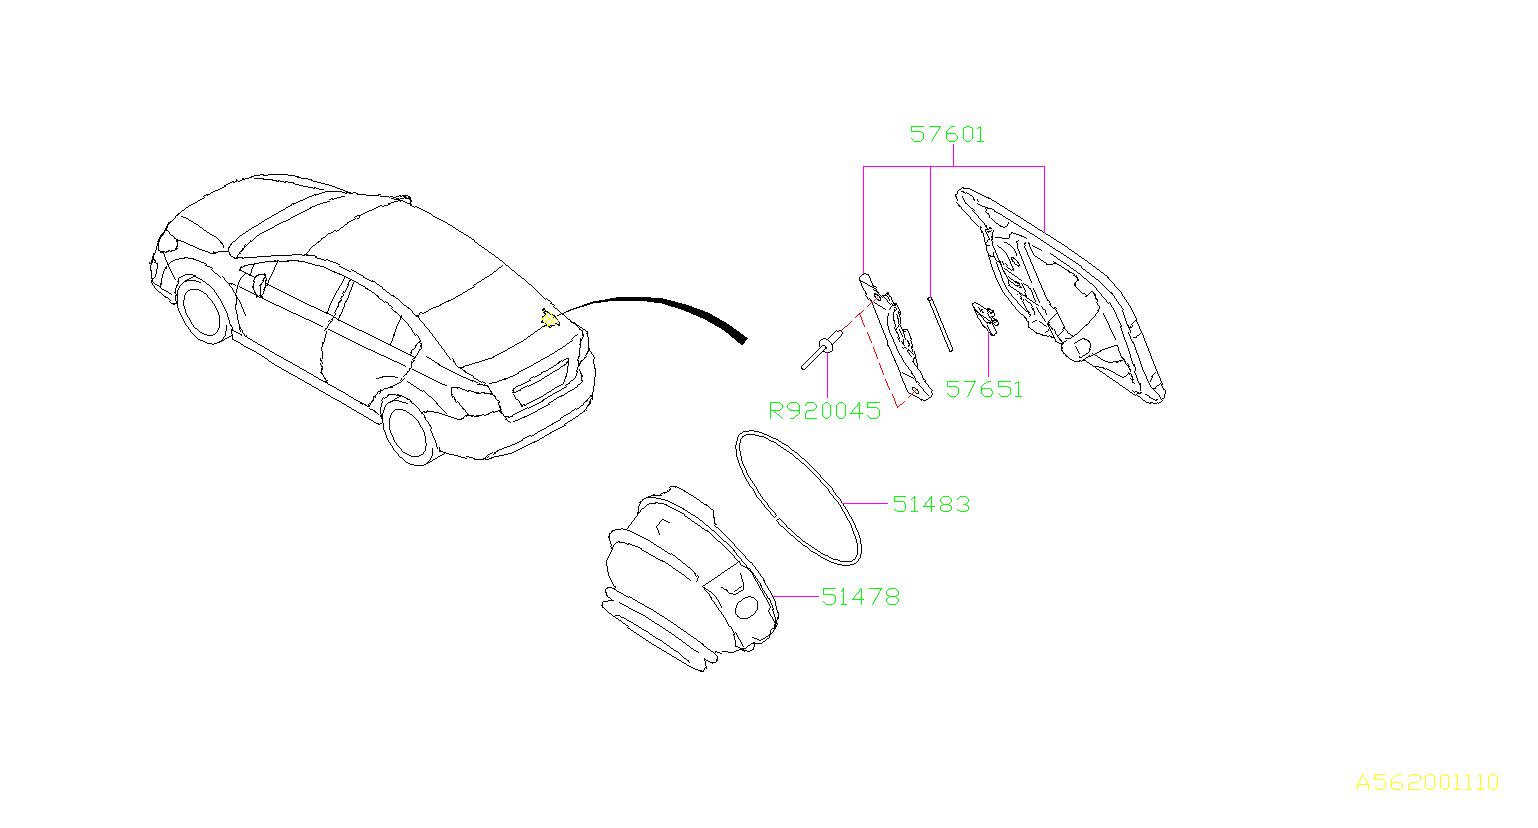 Brz Engine Diagram